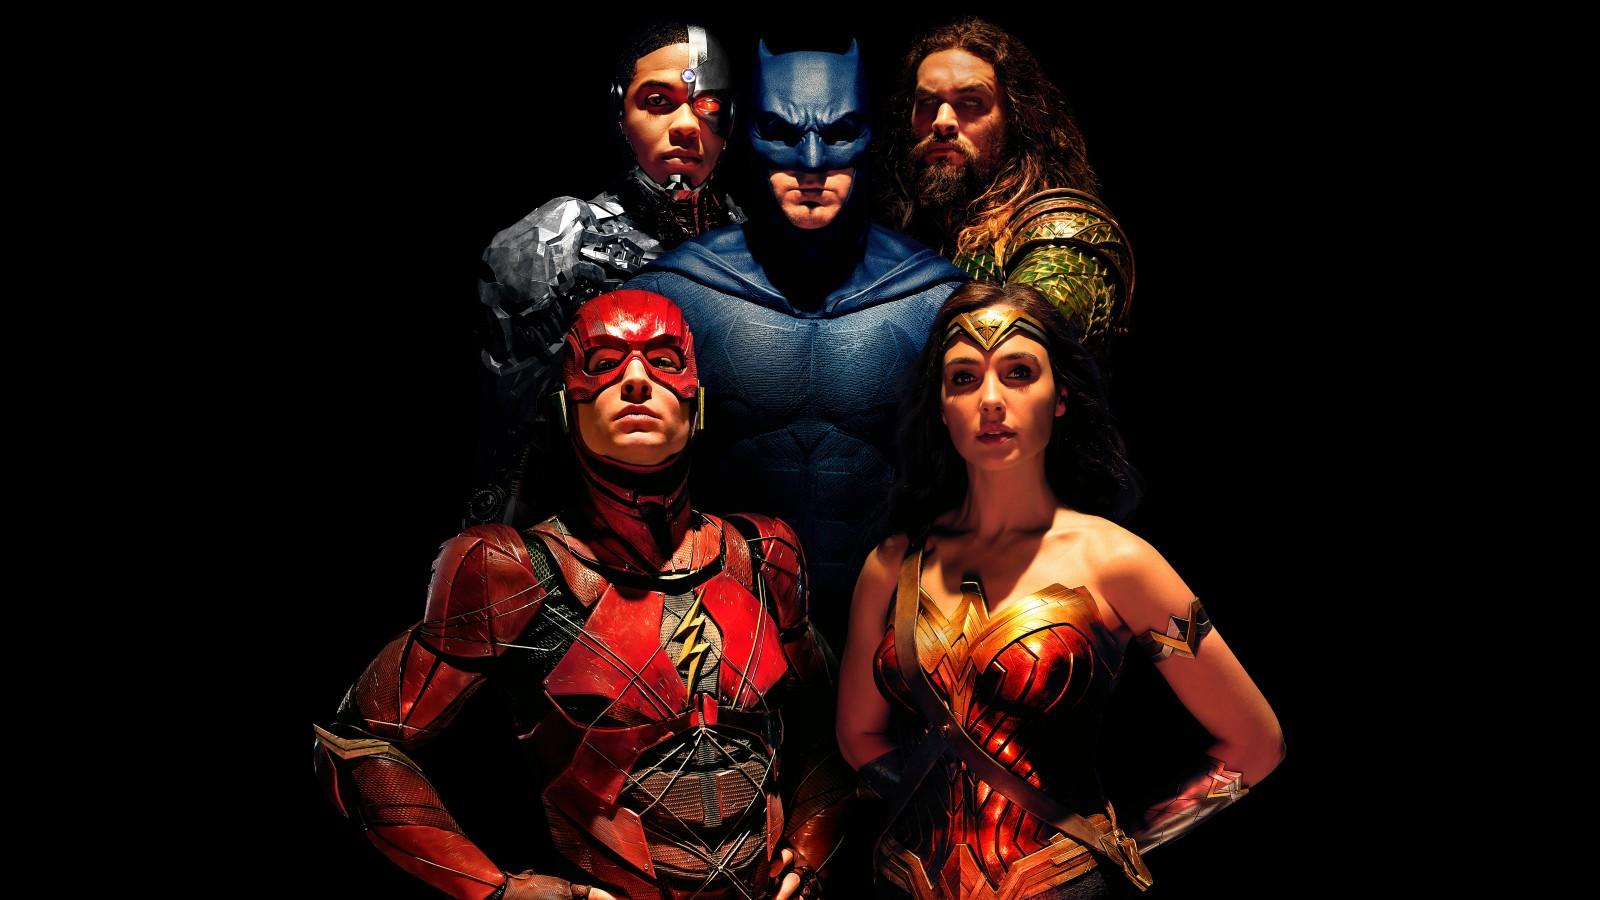 justice league 1600x900 wonder woman aquaman the flash batman cyborg 9655